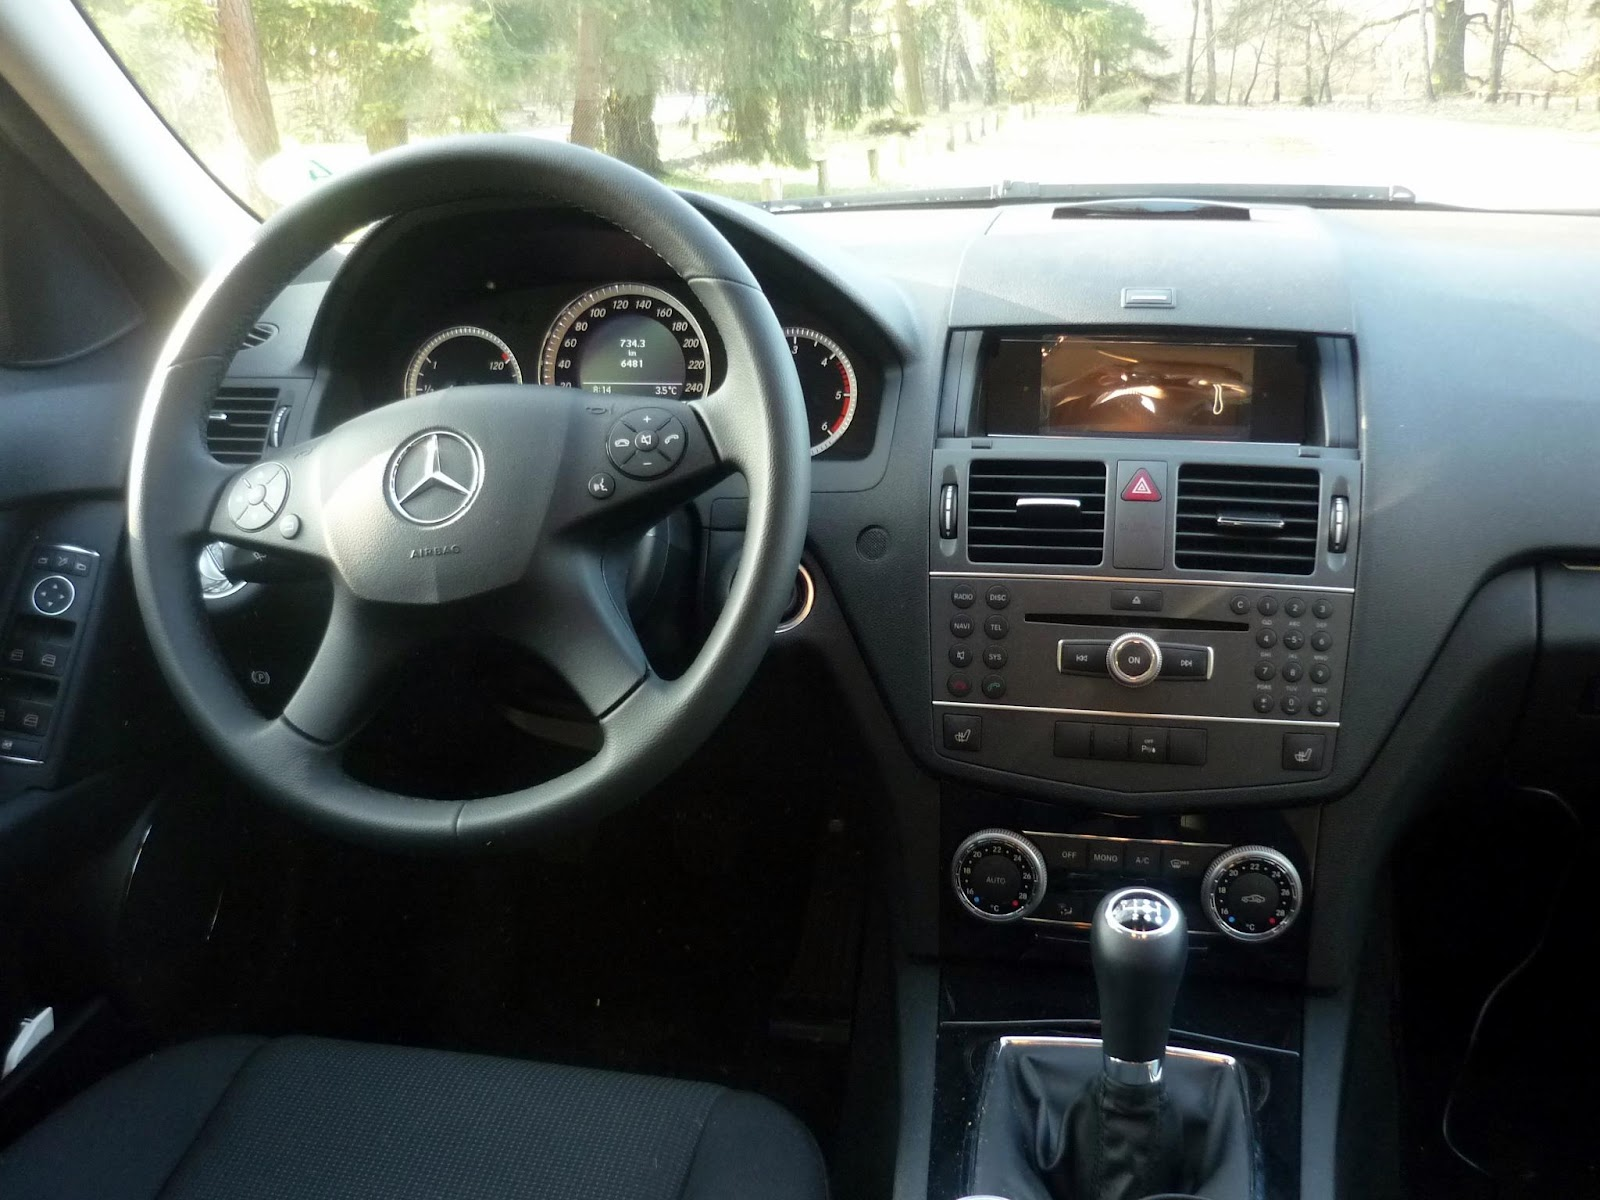 Guitigefilmpjes car review mercedes benz c180 avantgarde for Cdi interior design